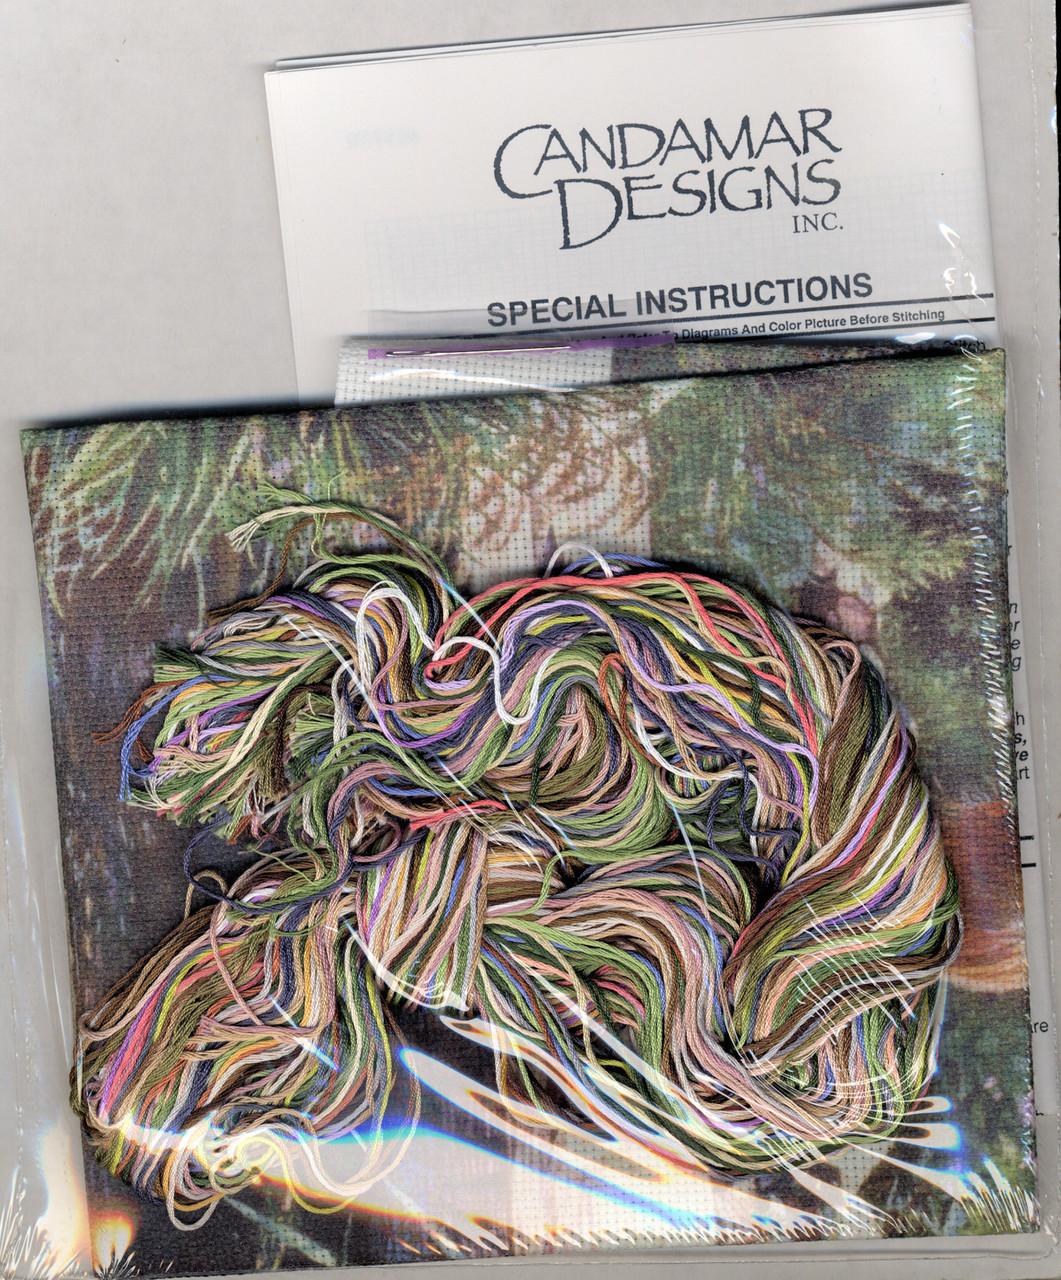 Candamar - Sending Flowers